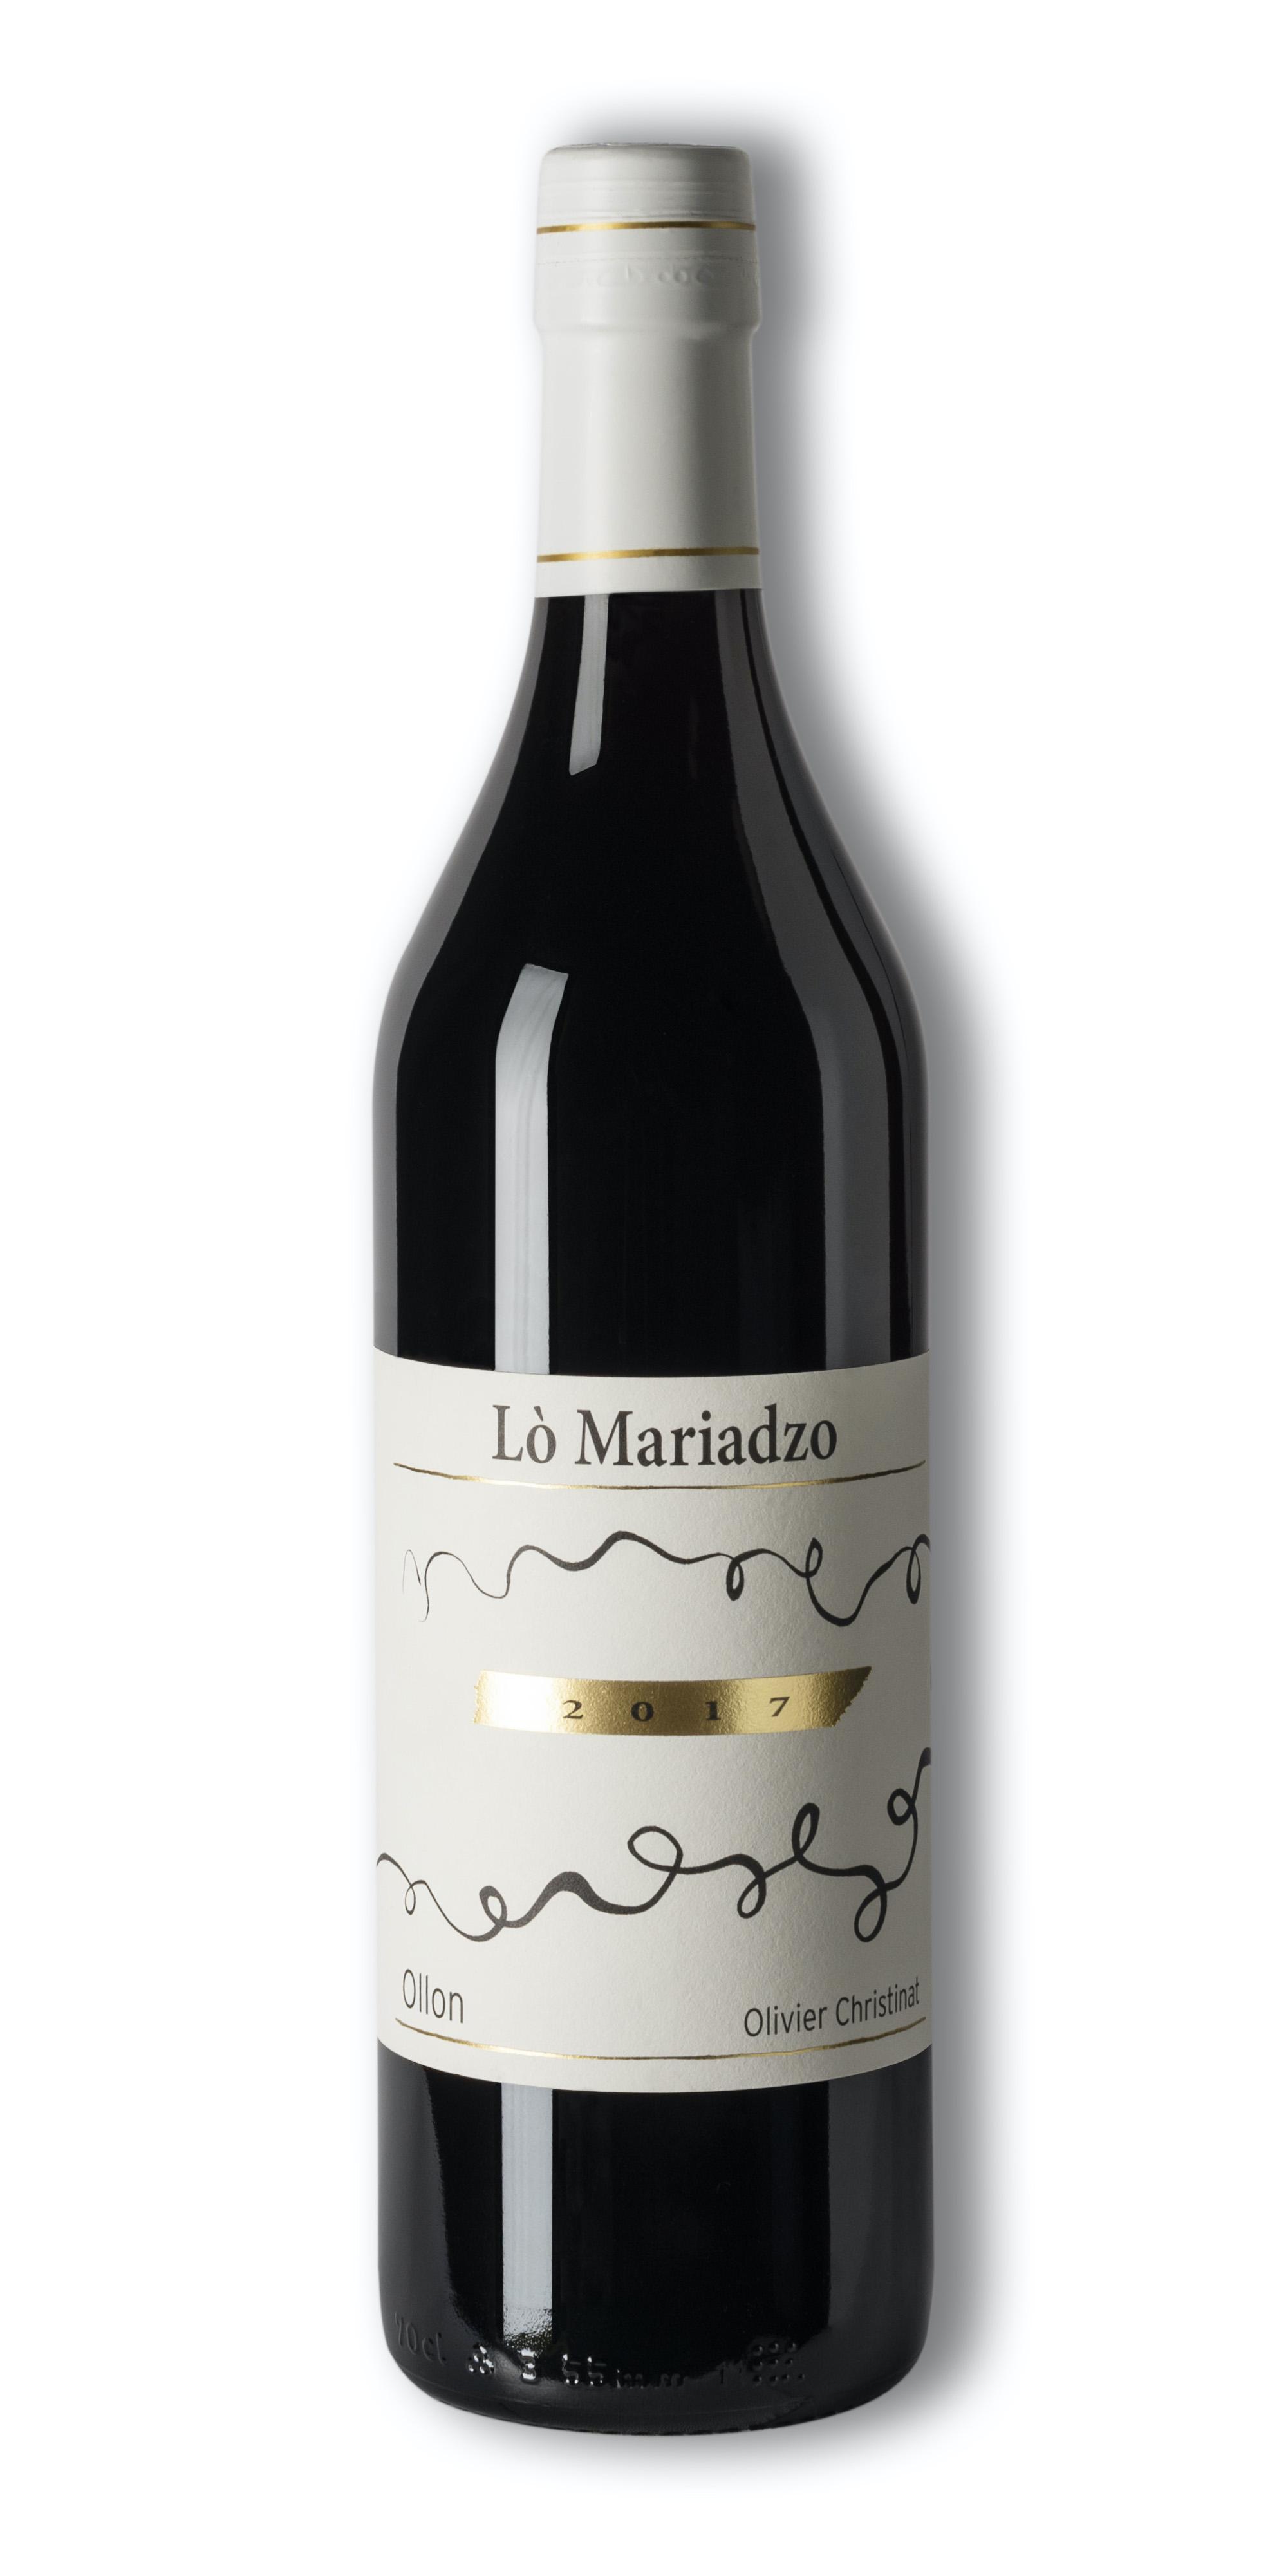 Lò Mariadzo